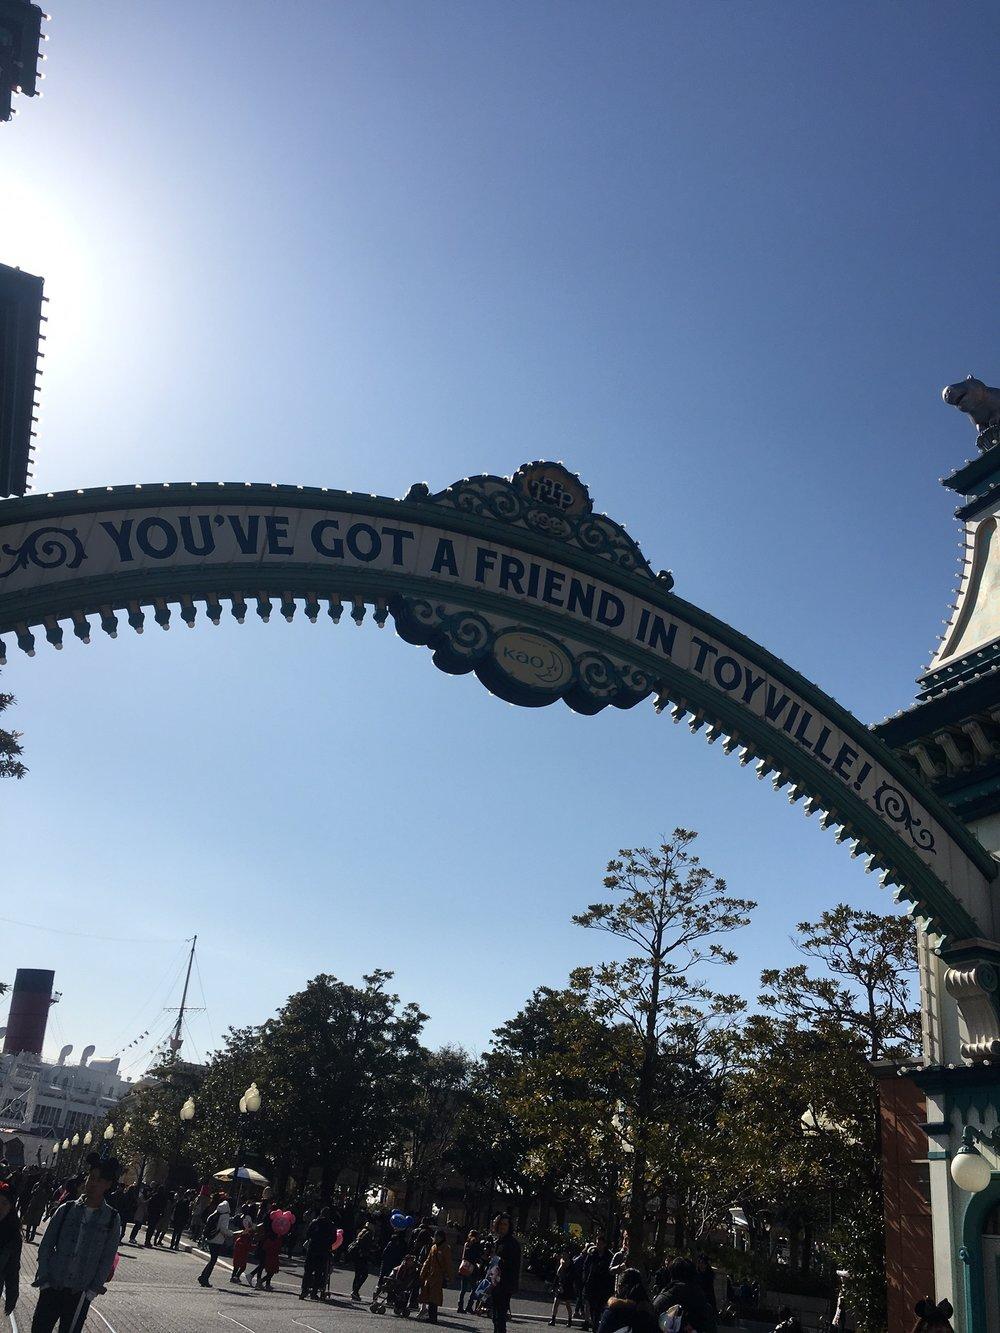 DisneySea-Schuyler-Croy-Youve-Got-a-Friend.JPG